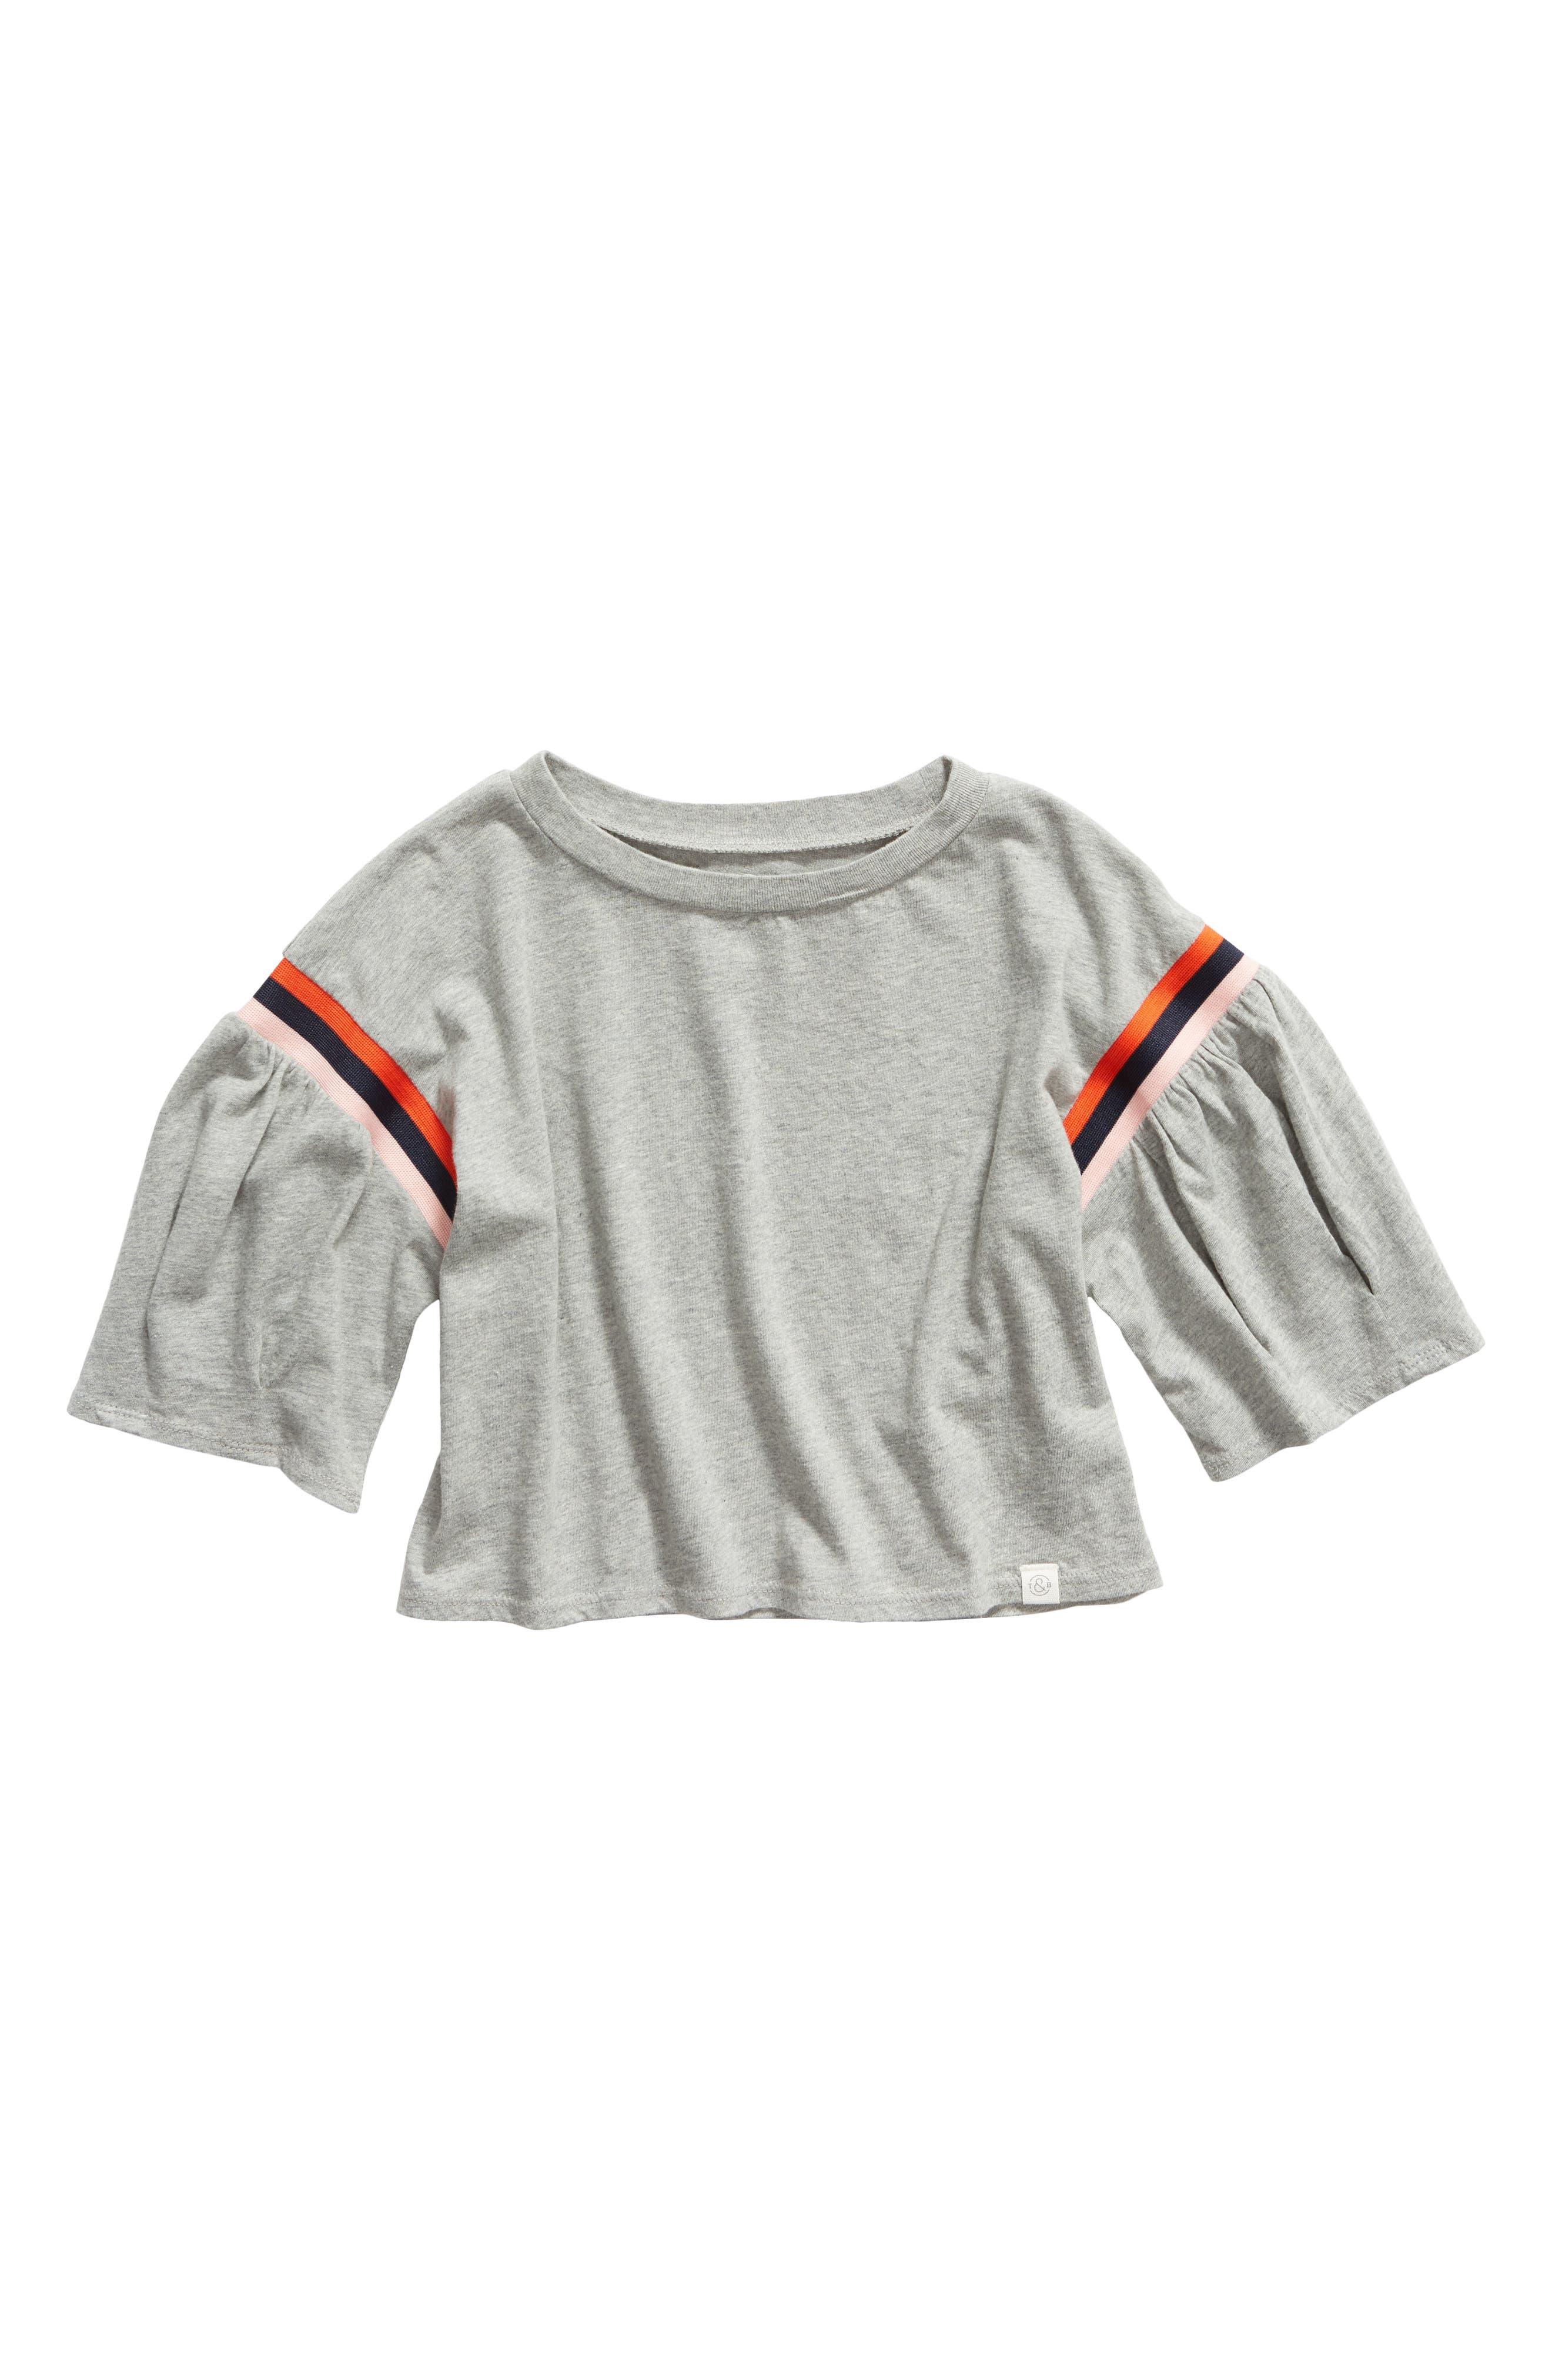 TREASURE & BOND Tuck Sleeve Top, Main, color, GREY MEDIUM HEATHER